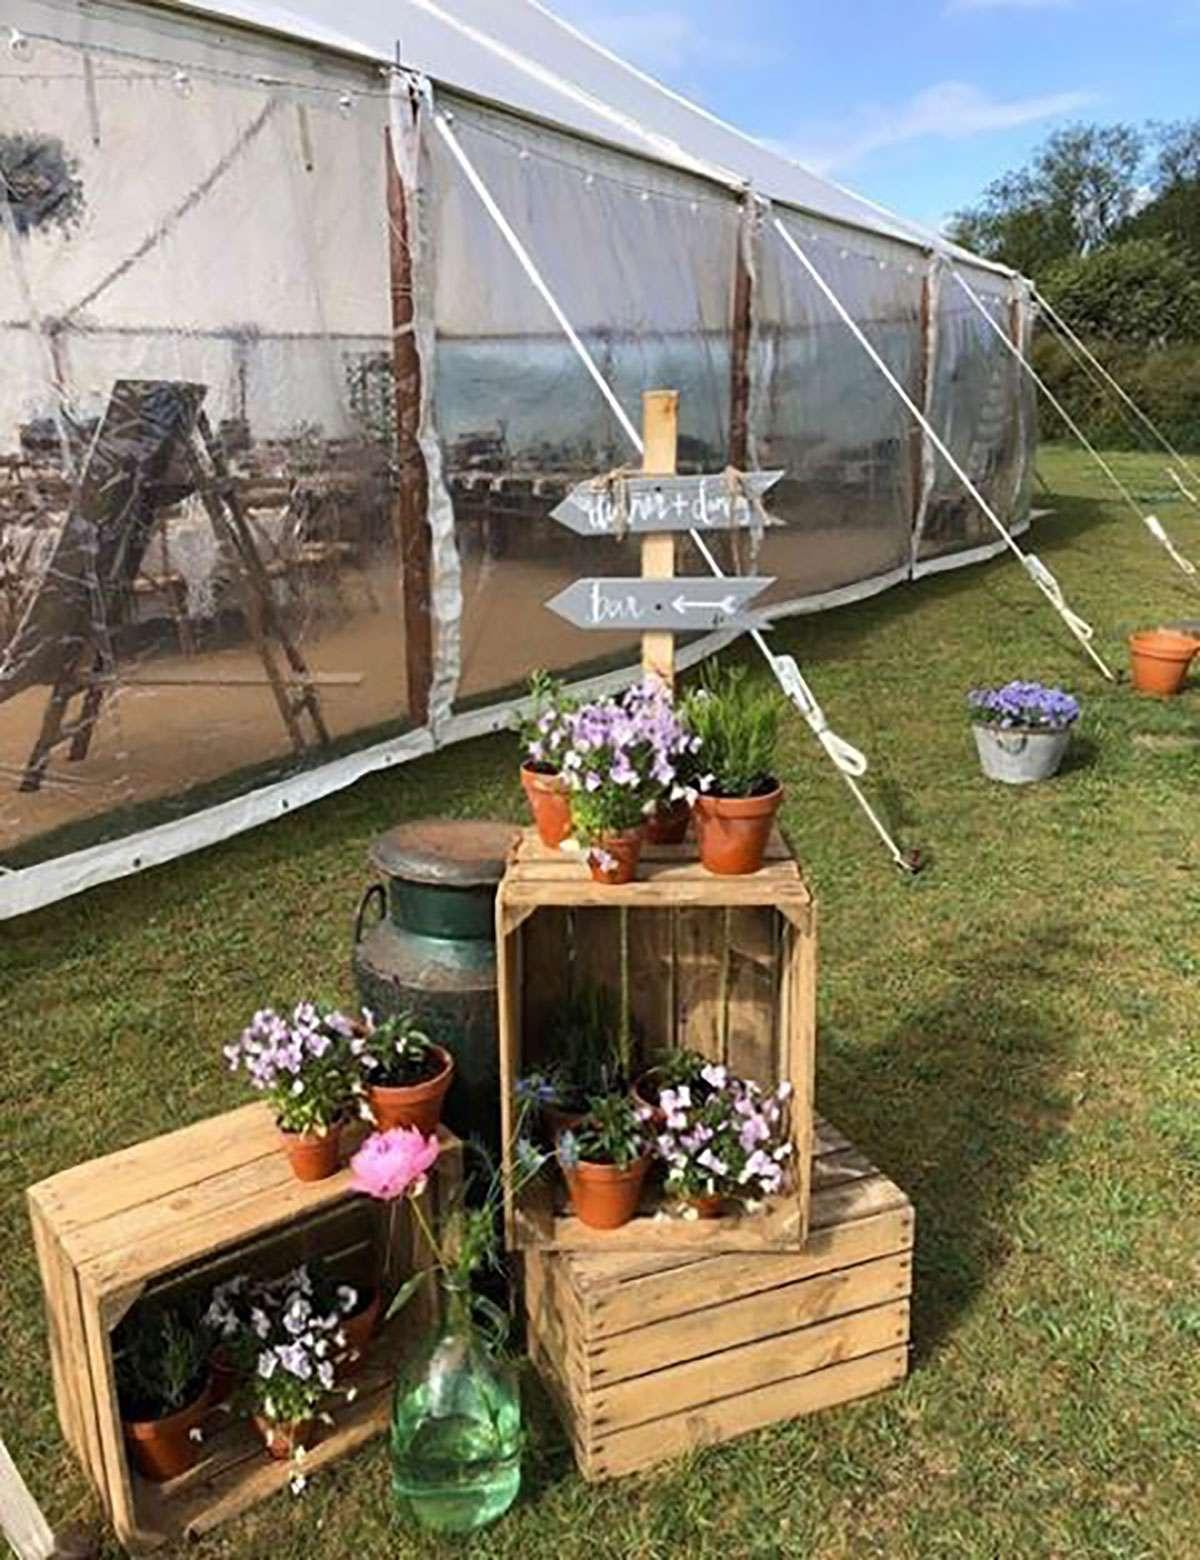 Decor outside sailcloth tent